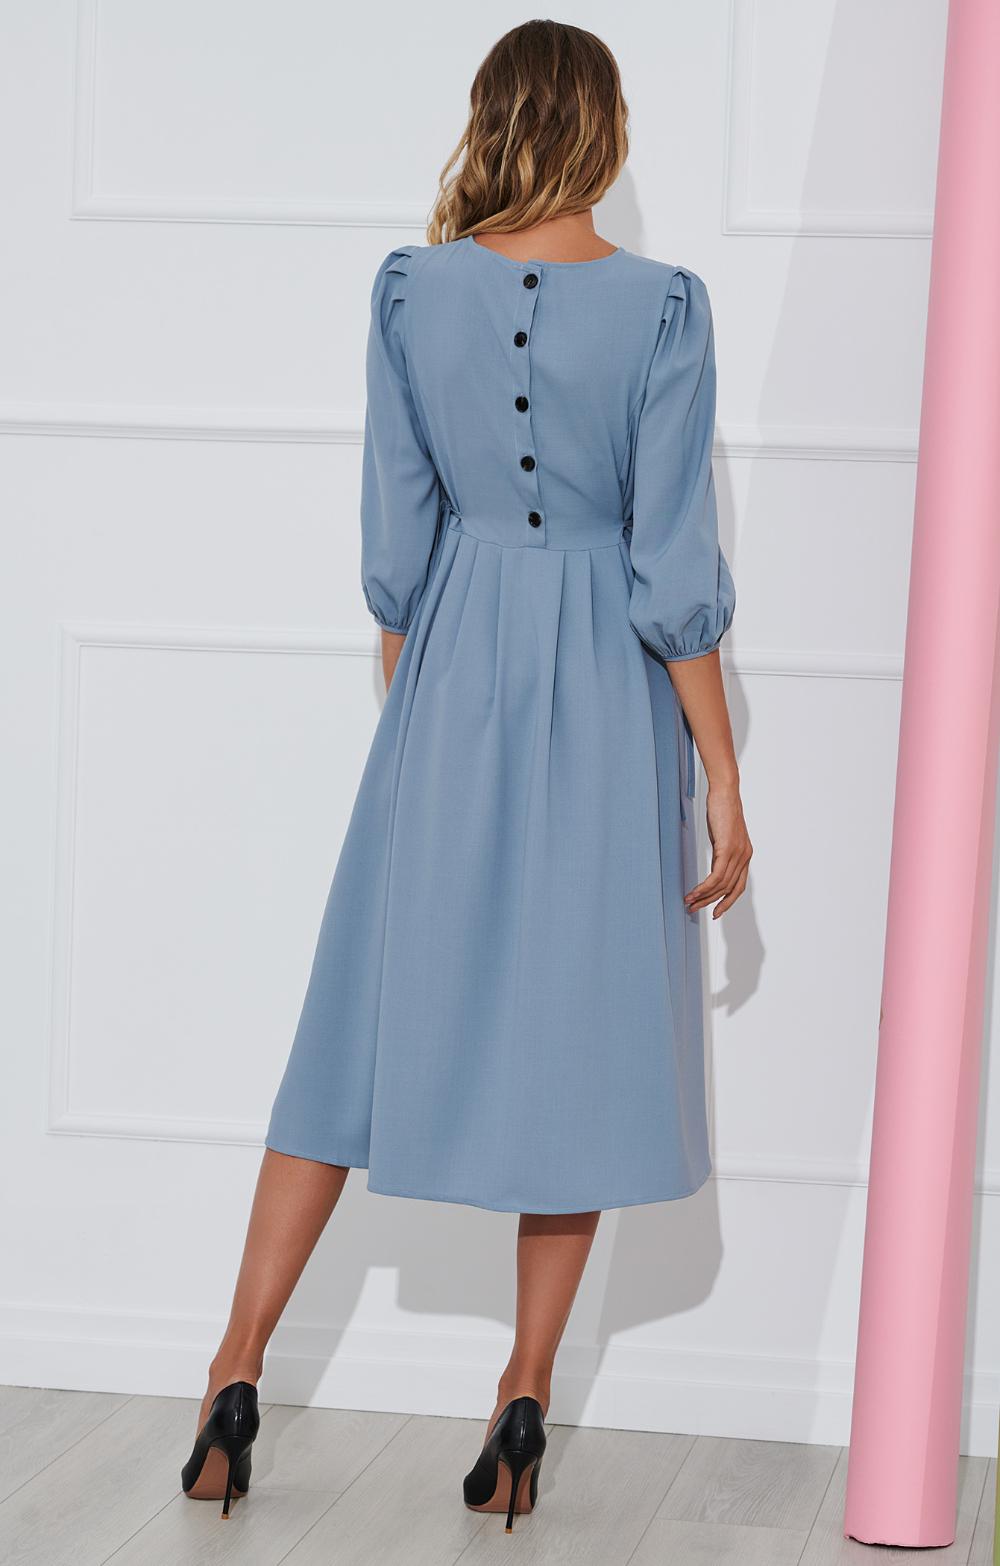 10 Top Halblange Kleider Mode Galerie15 Einzigartig Halblange Kleider Mode Design